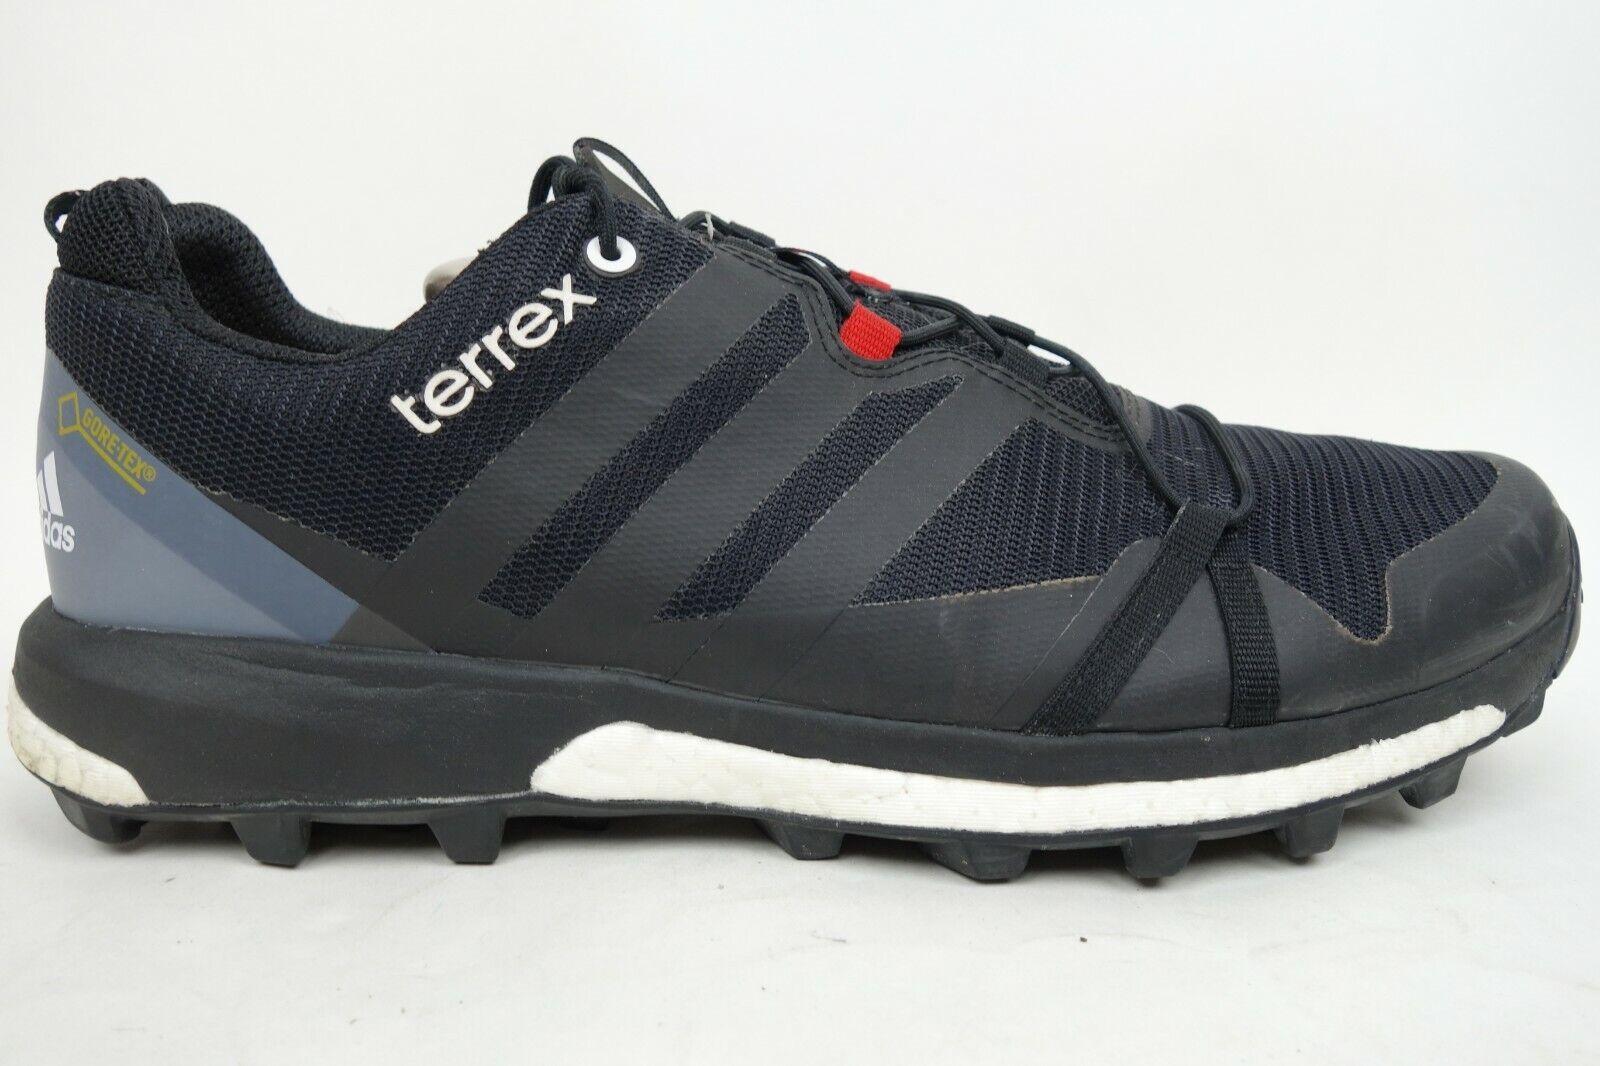 Adidas Terrex Agravic GTX Gore-Tex Boost Trail Running shoes Men Size 12